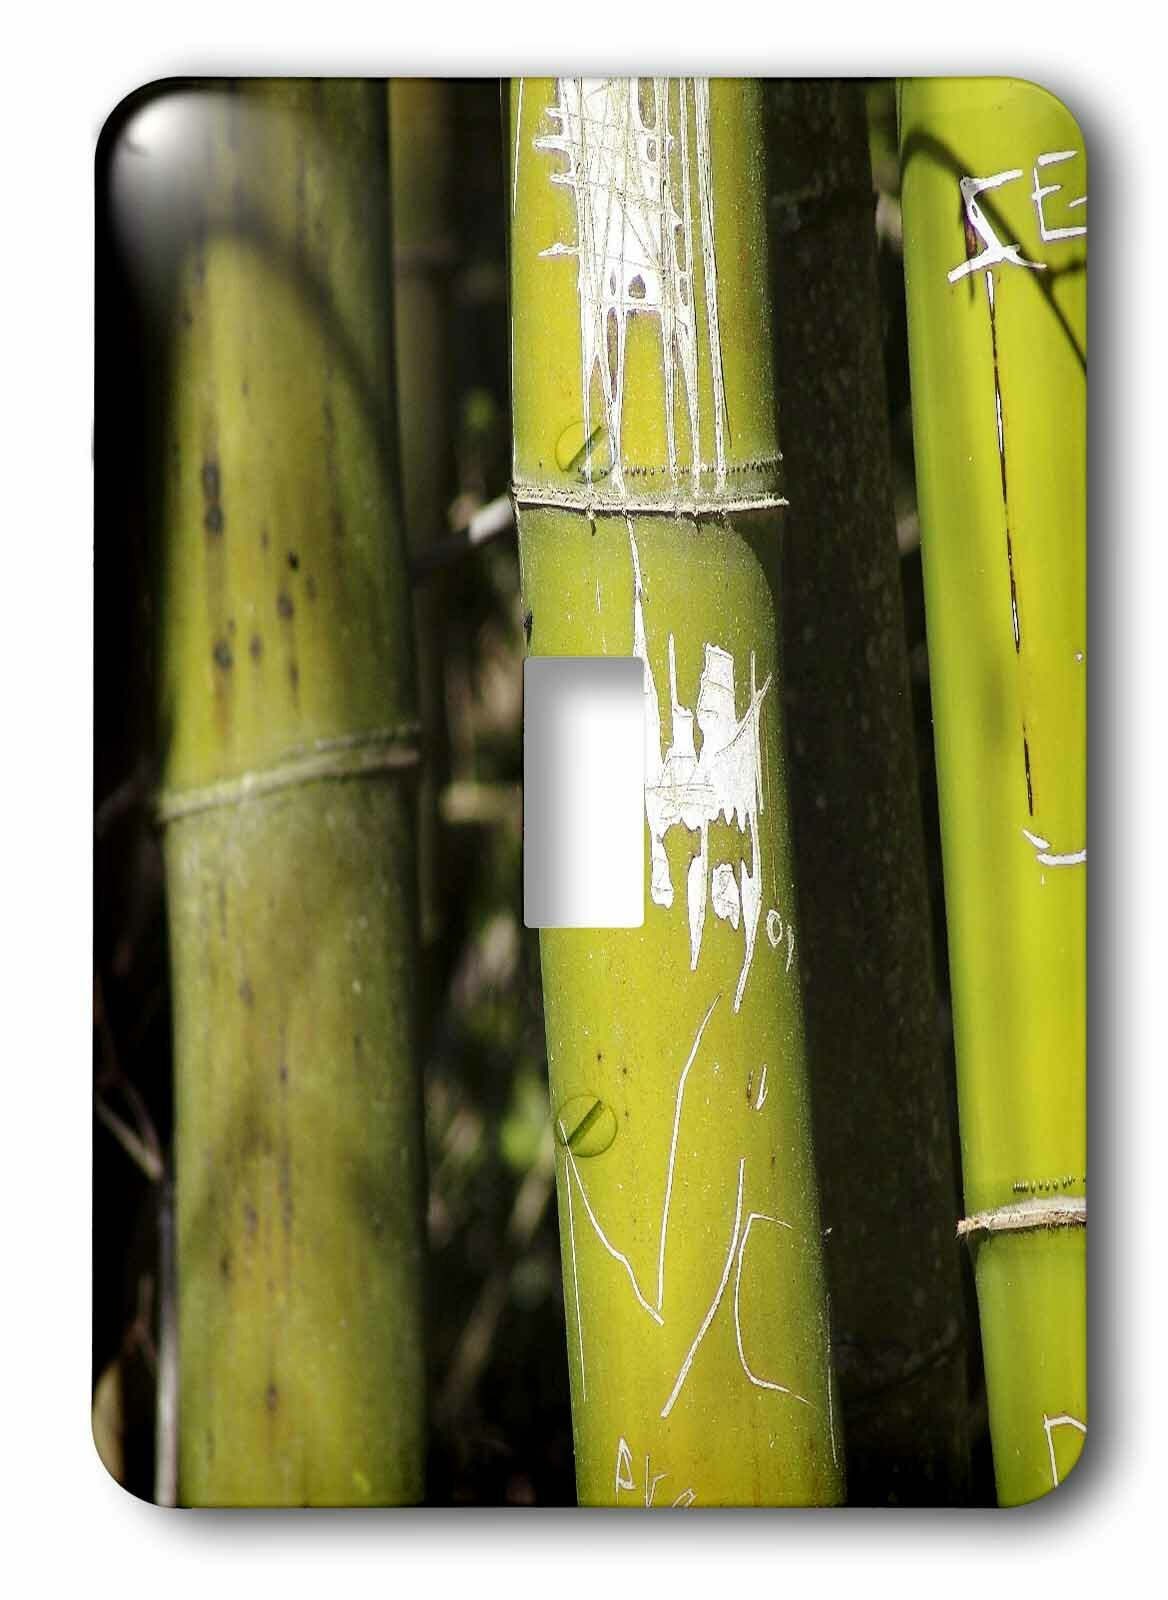 3drose Bamboo Art 1 Gang Toggle Light Switch Wall Plate Wayfair